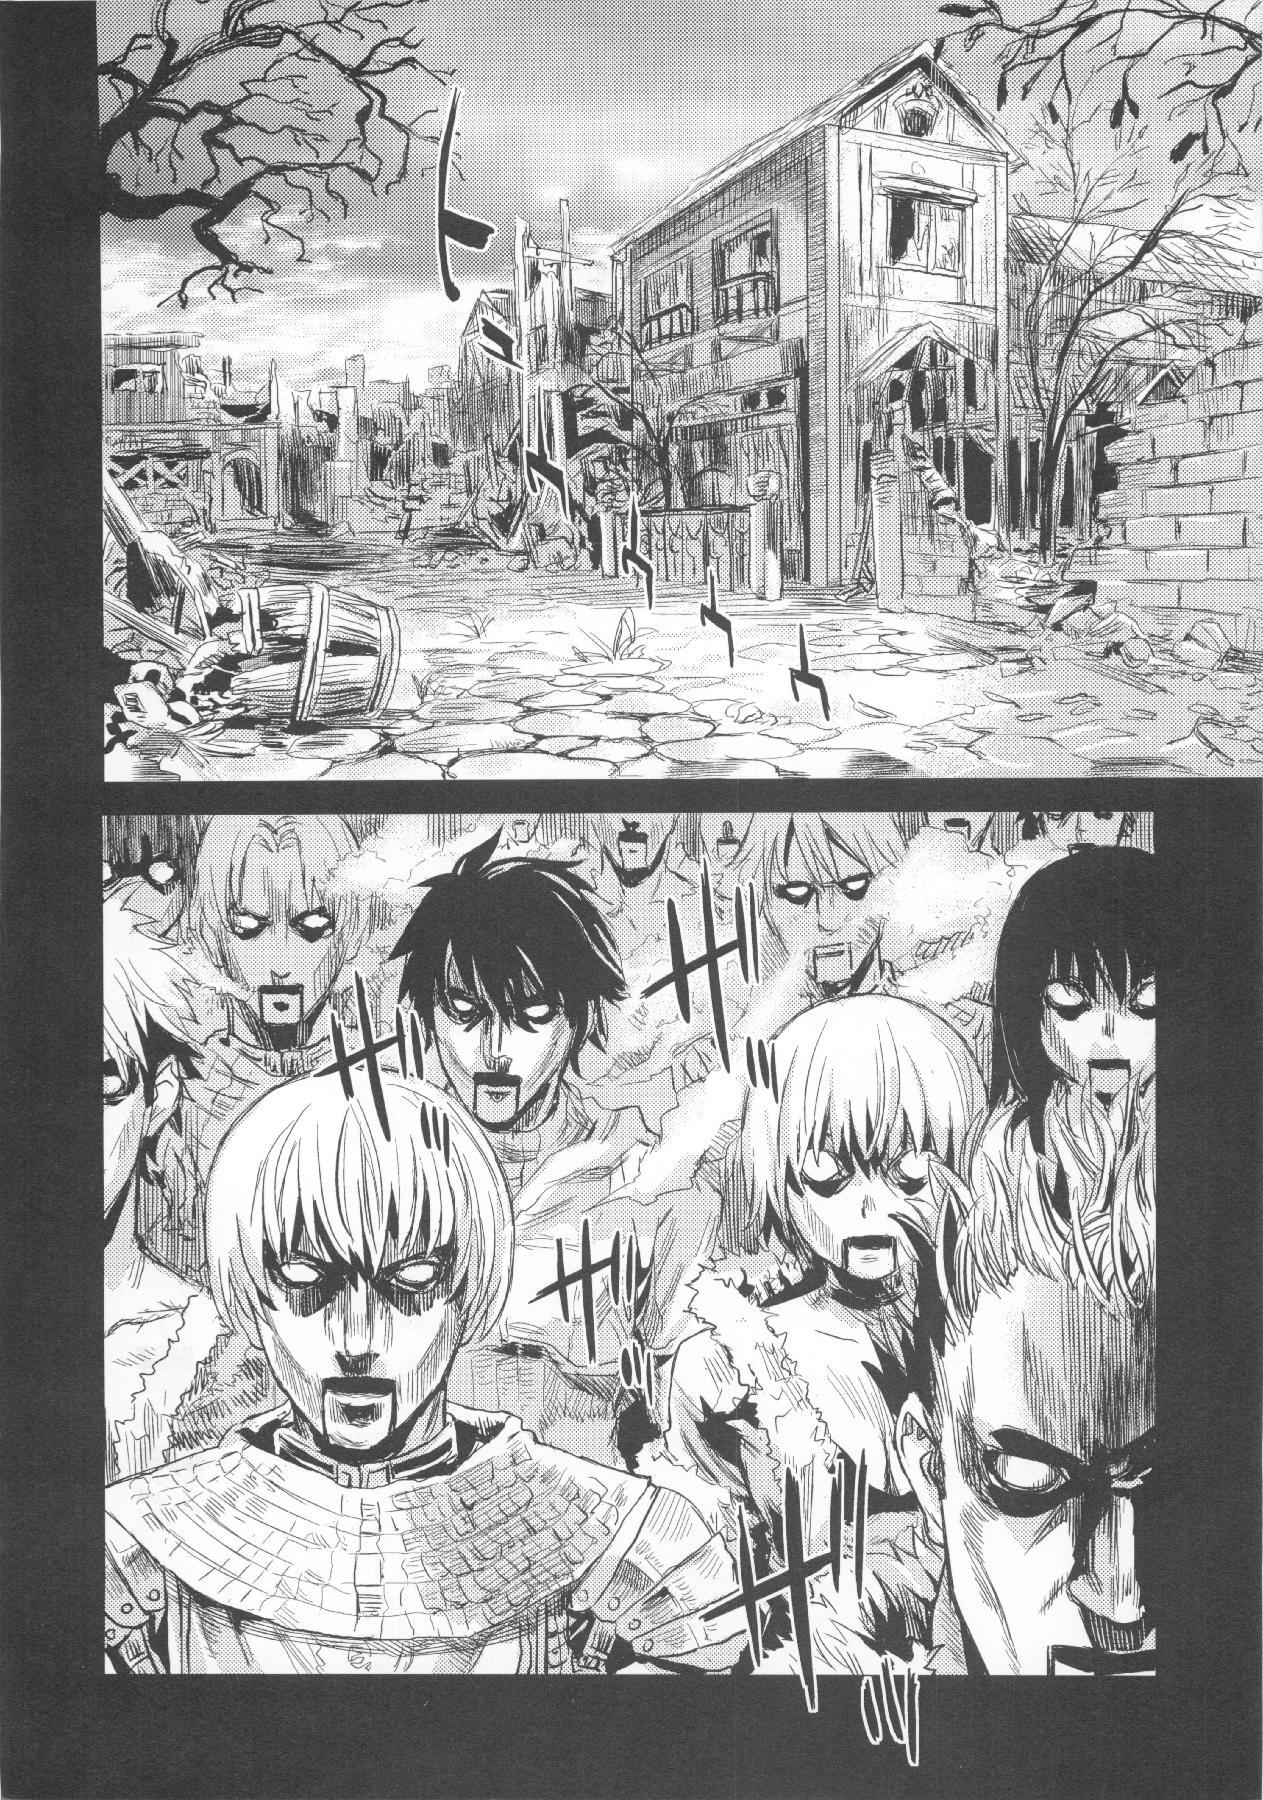 (C83) [Fatalpulse (Asanagi)] VictimGirls Compiled Vol.1 -Victimgirls Soushuuhen 1- MMO Game Selection (Various) 8